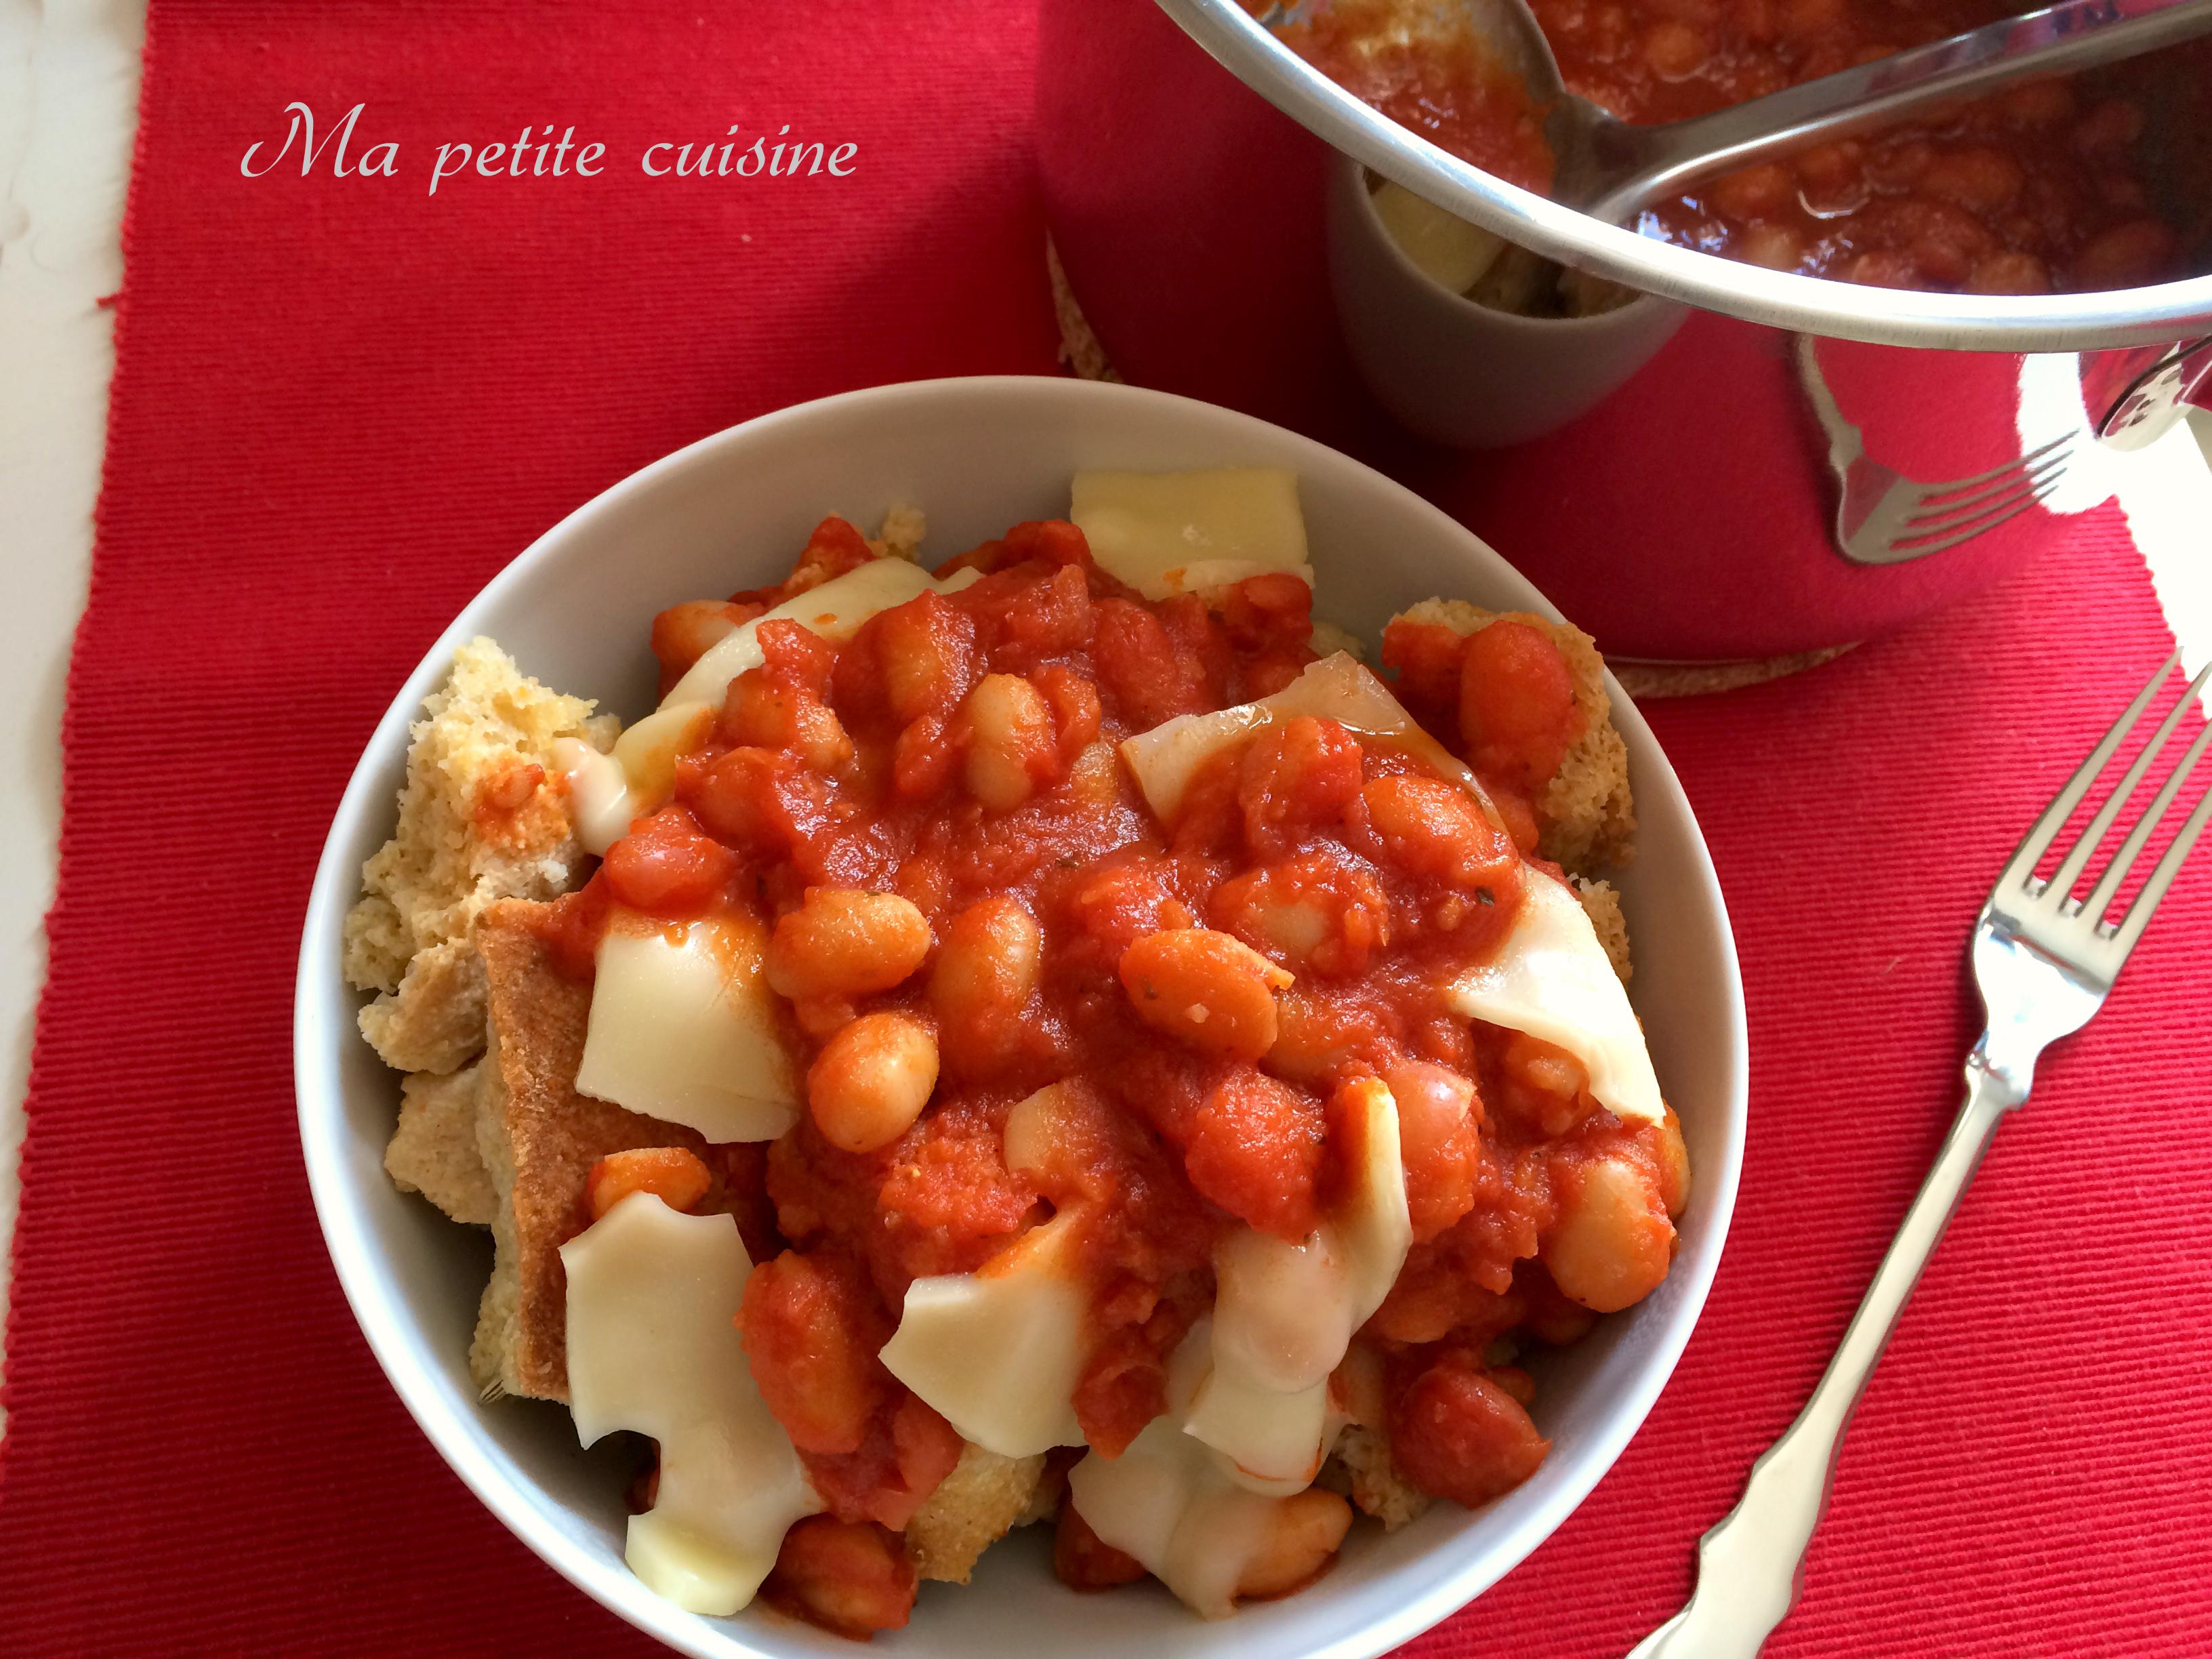 Fagioli al sugo su pane biscottato video ricetta ma petite cuisine - Ma petite cuisine by audrey ...